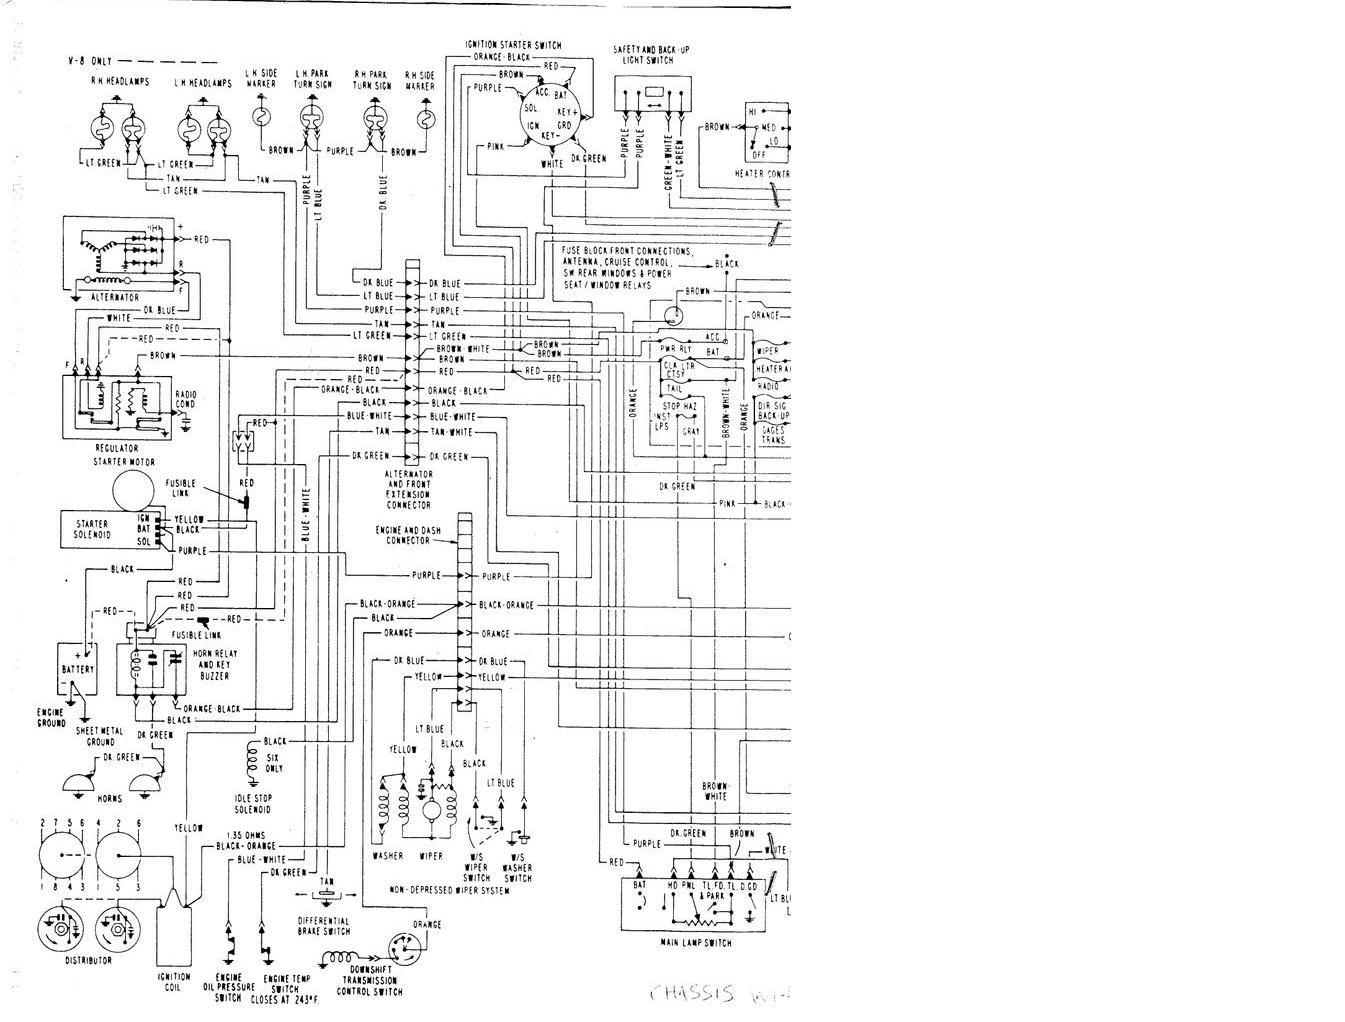 Wiring Diagram 455 Olds